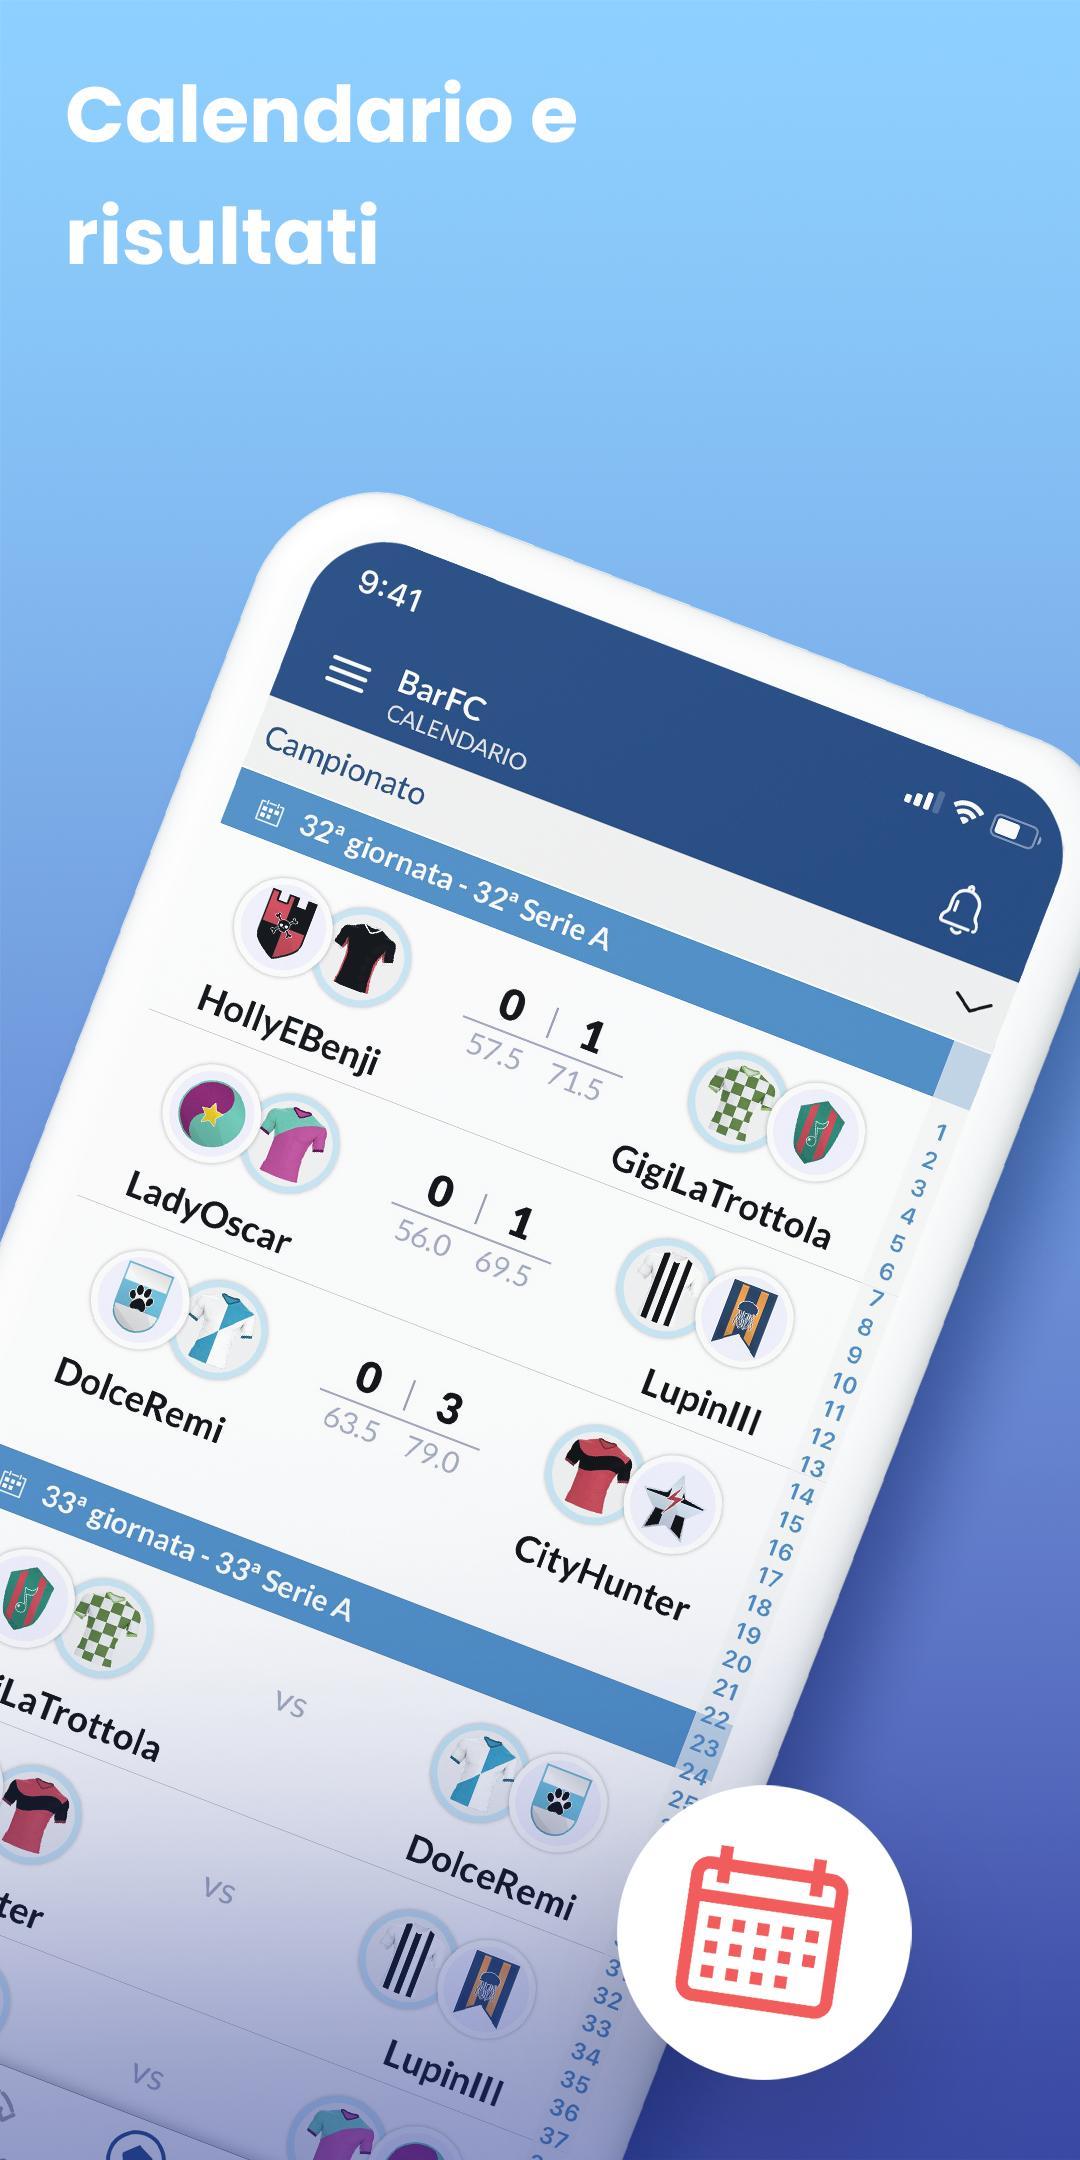 Calendario Serie A Download.Leghe Fantacalcio For Android Apk Download